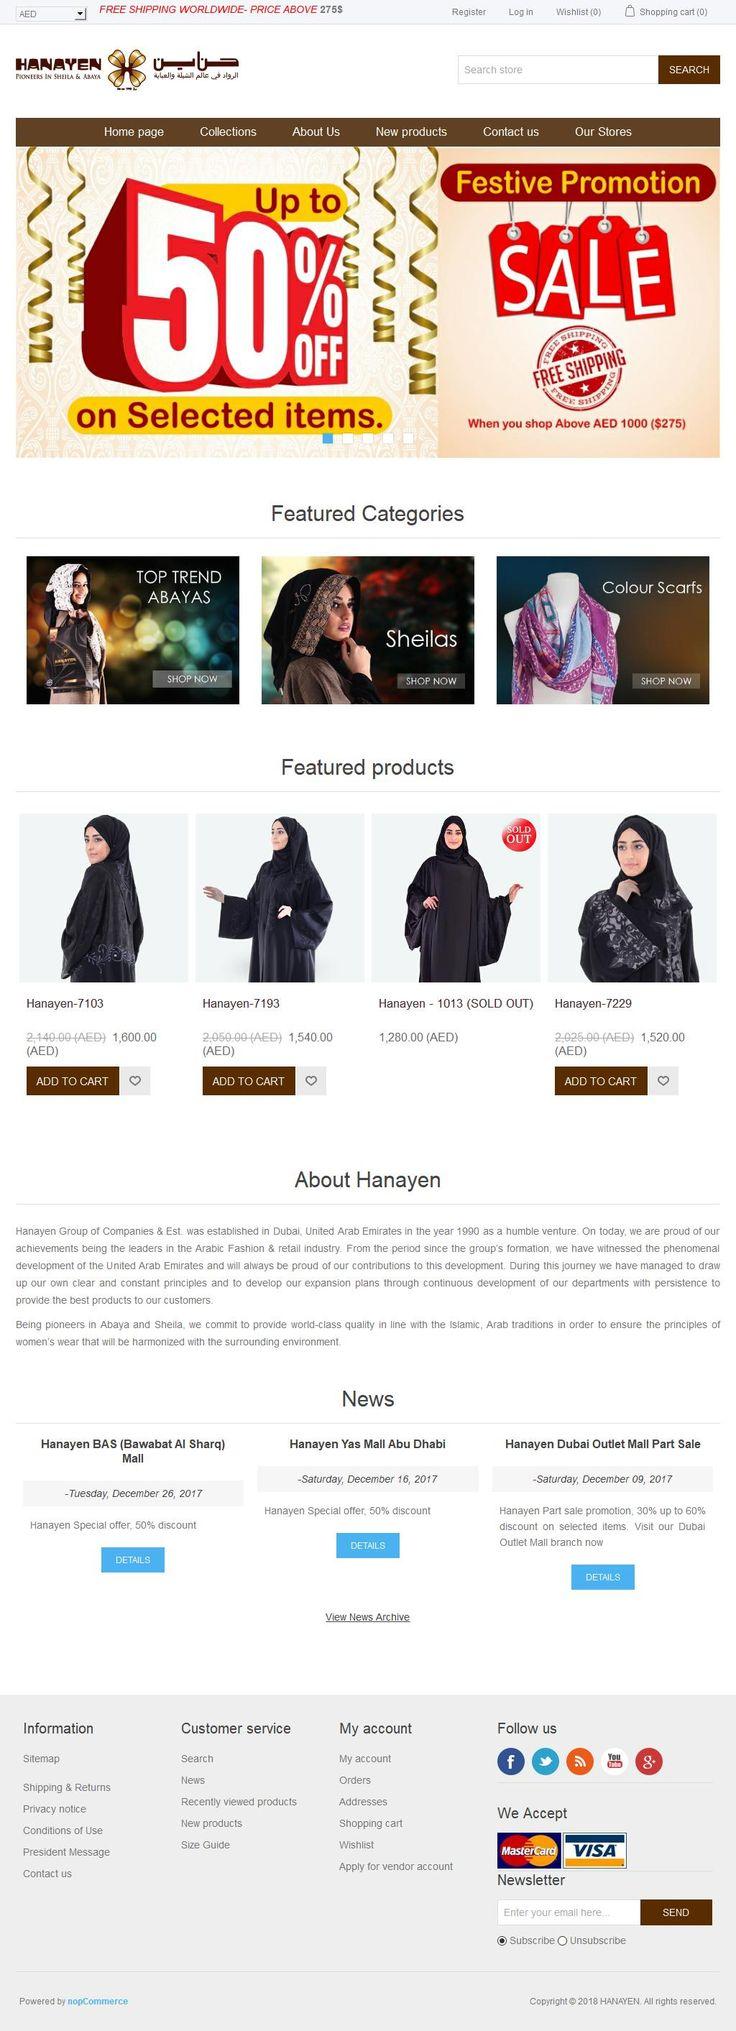 Hanayen Clothing Shop Mirdif City Center, 70, Sheikh Mohammed Bin Zayed Road near Centerpoint, G Floor Mirdif - 251, Mushraif, Dubai   www.HaiUAE.com is a complete Travel Guide to Dubai, Ajman, Alain, Abu Dhabi, Fujairah, Sharjah, Ras al khaimah, Umm Al Quwain, United Arab Emirates, GCC Countries. Explore more about 2gis, Q Express, Barsha Police Station, Acico Business Park, Sharjah Justice